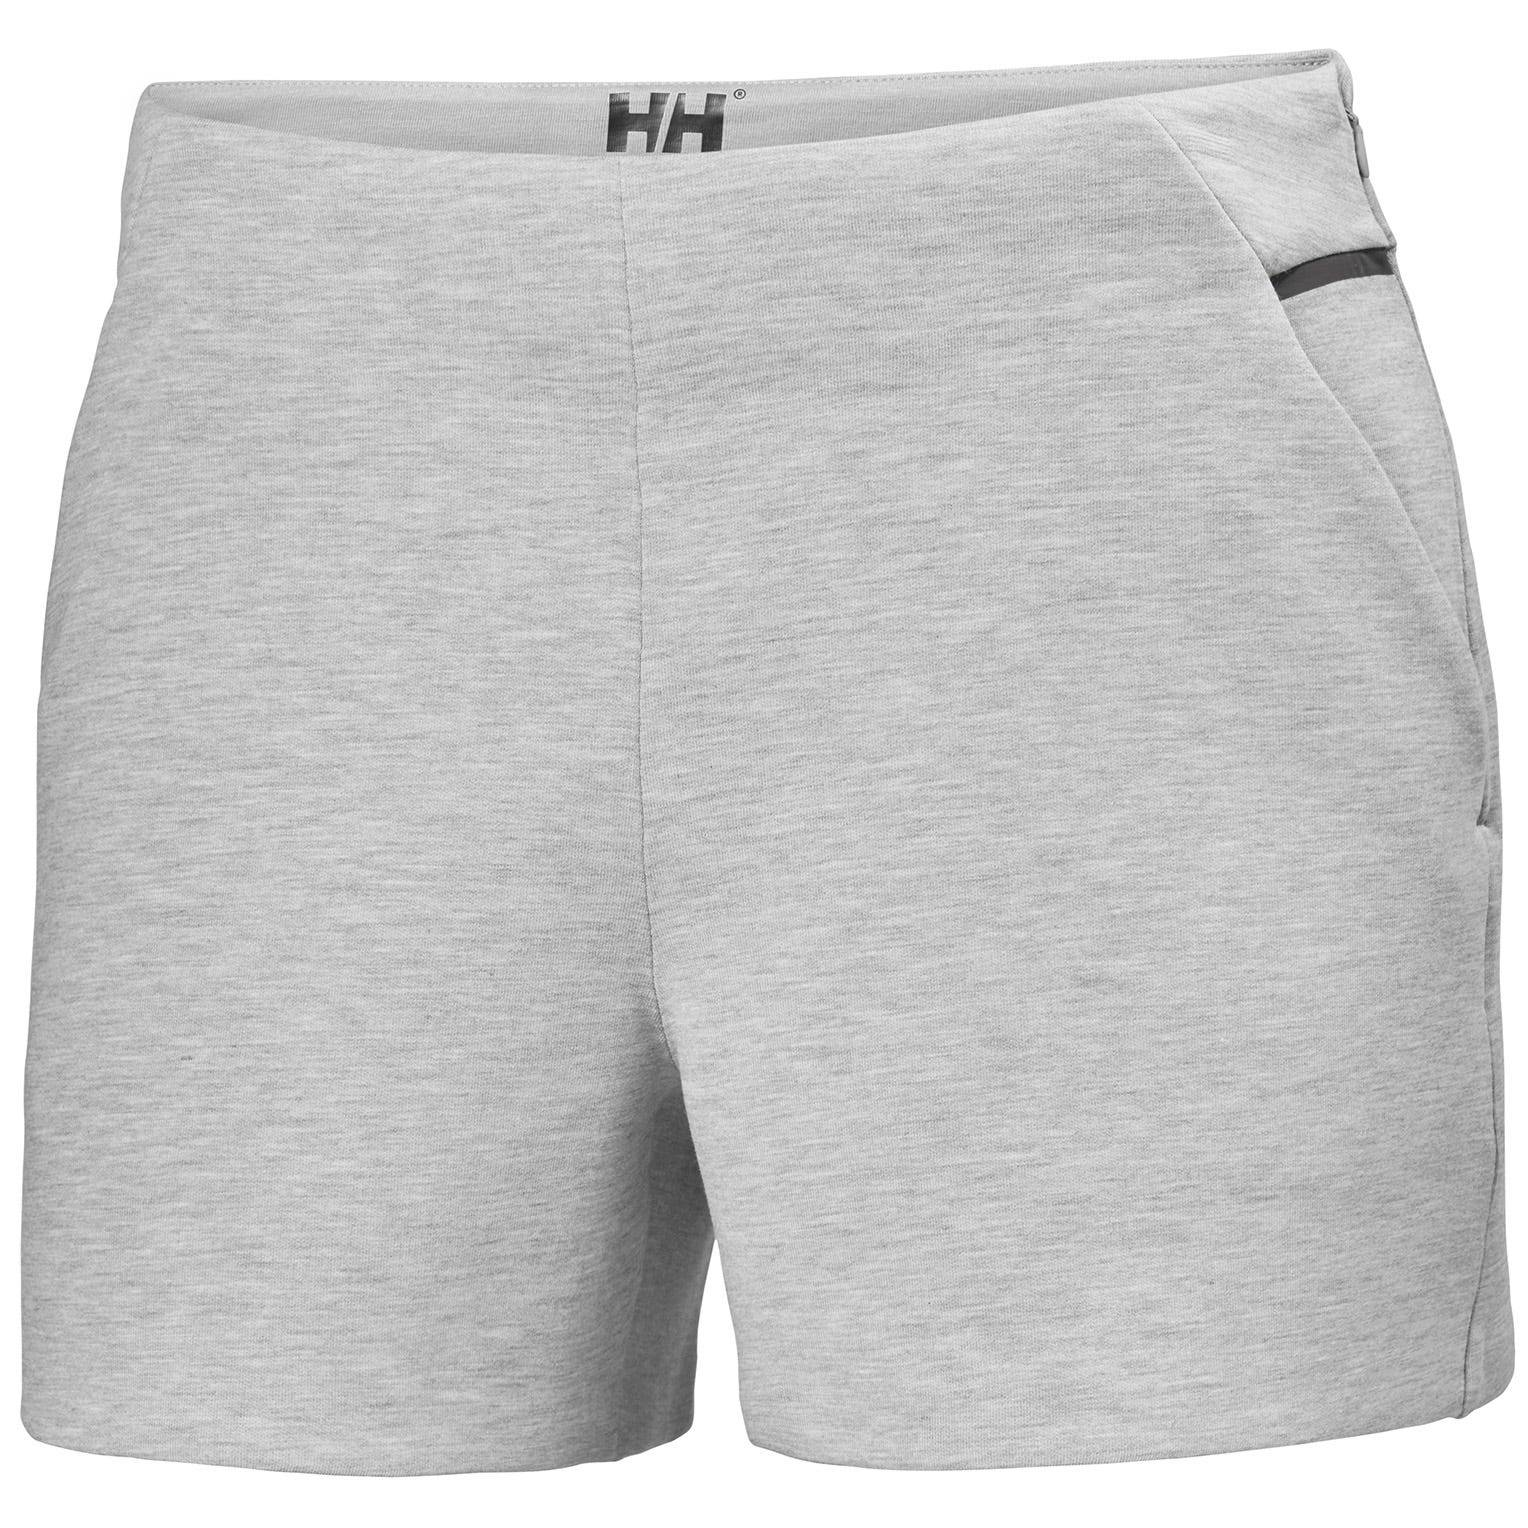 Helly Hansen Dame Hp Ocean Swt Shorts Seilerbukse Grå L